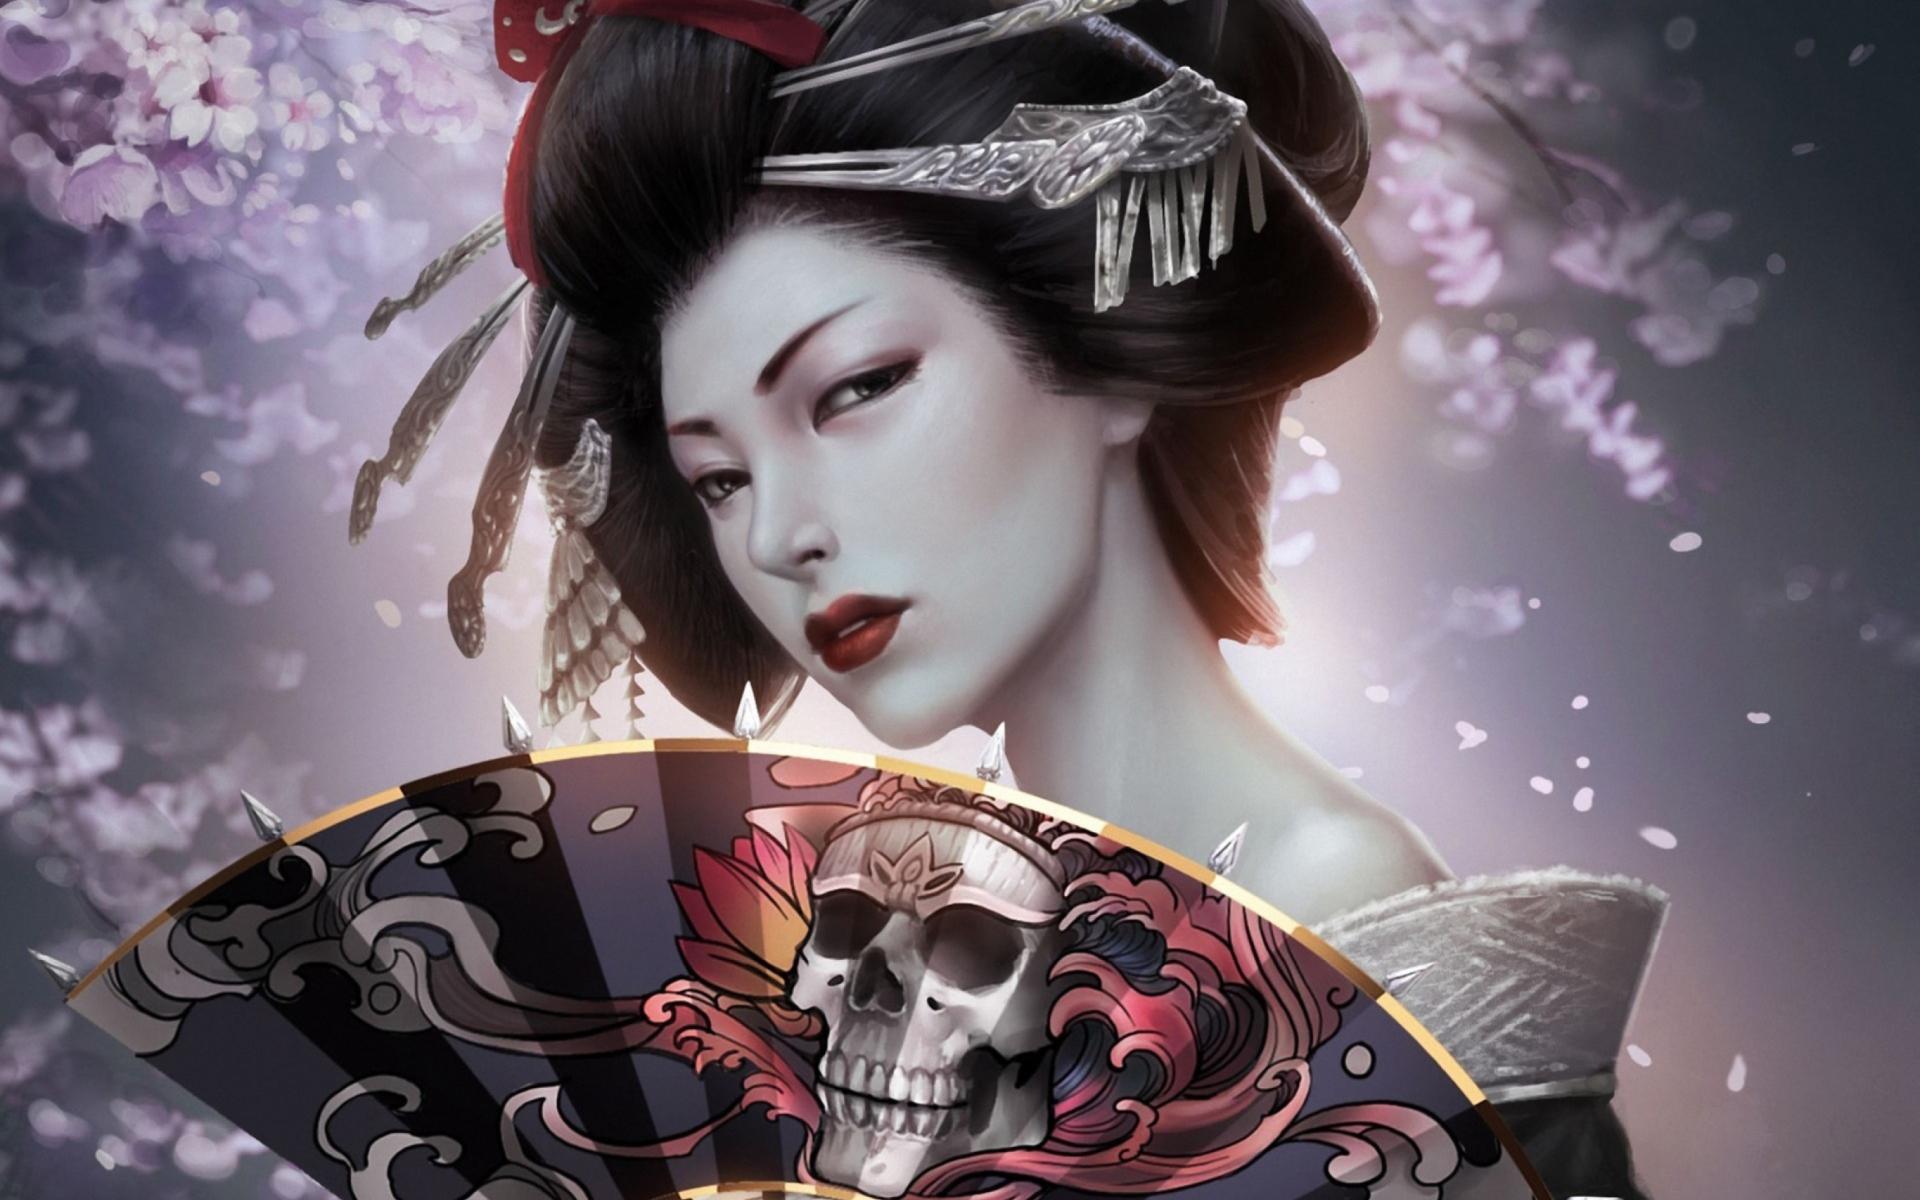 wallpaper geisha corals girl - photo #21